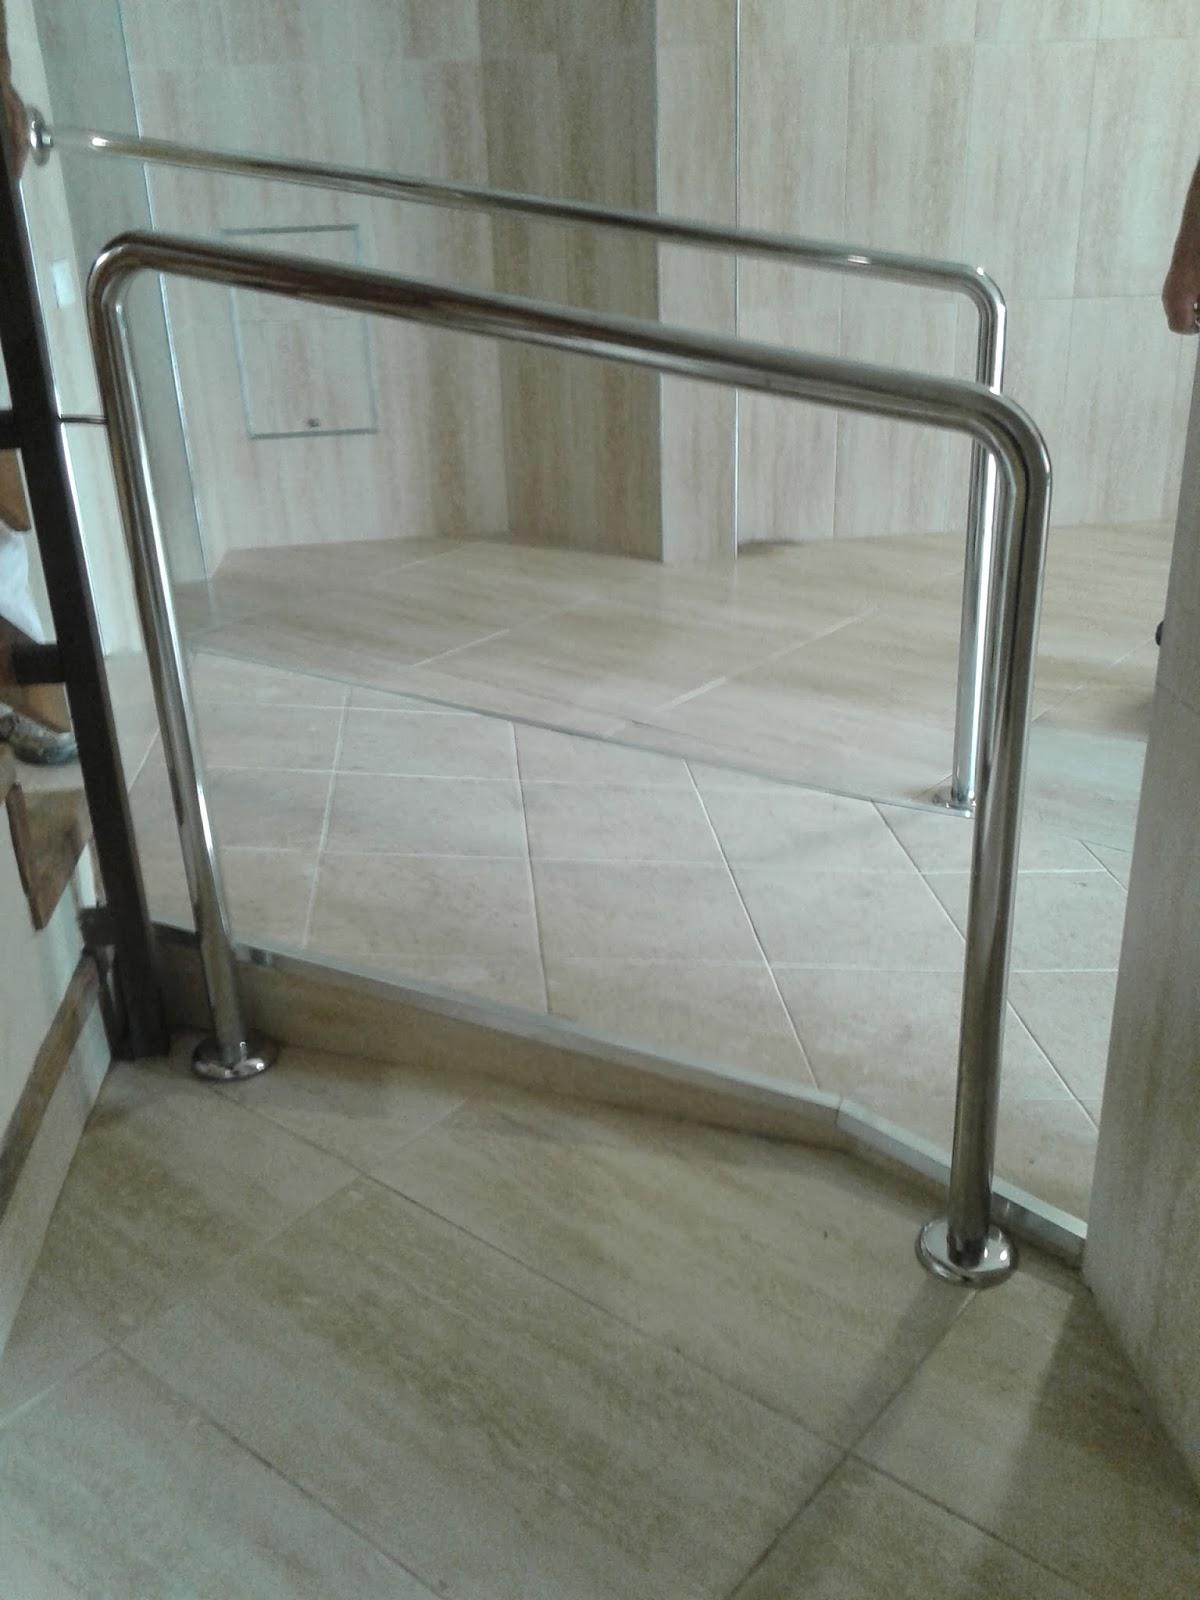 Acero inoxidable tenerife pasamanos para rampas y - Pasamanos escaleras acero inoxidable ...